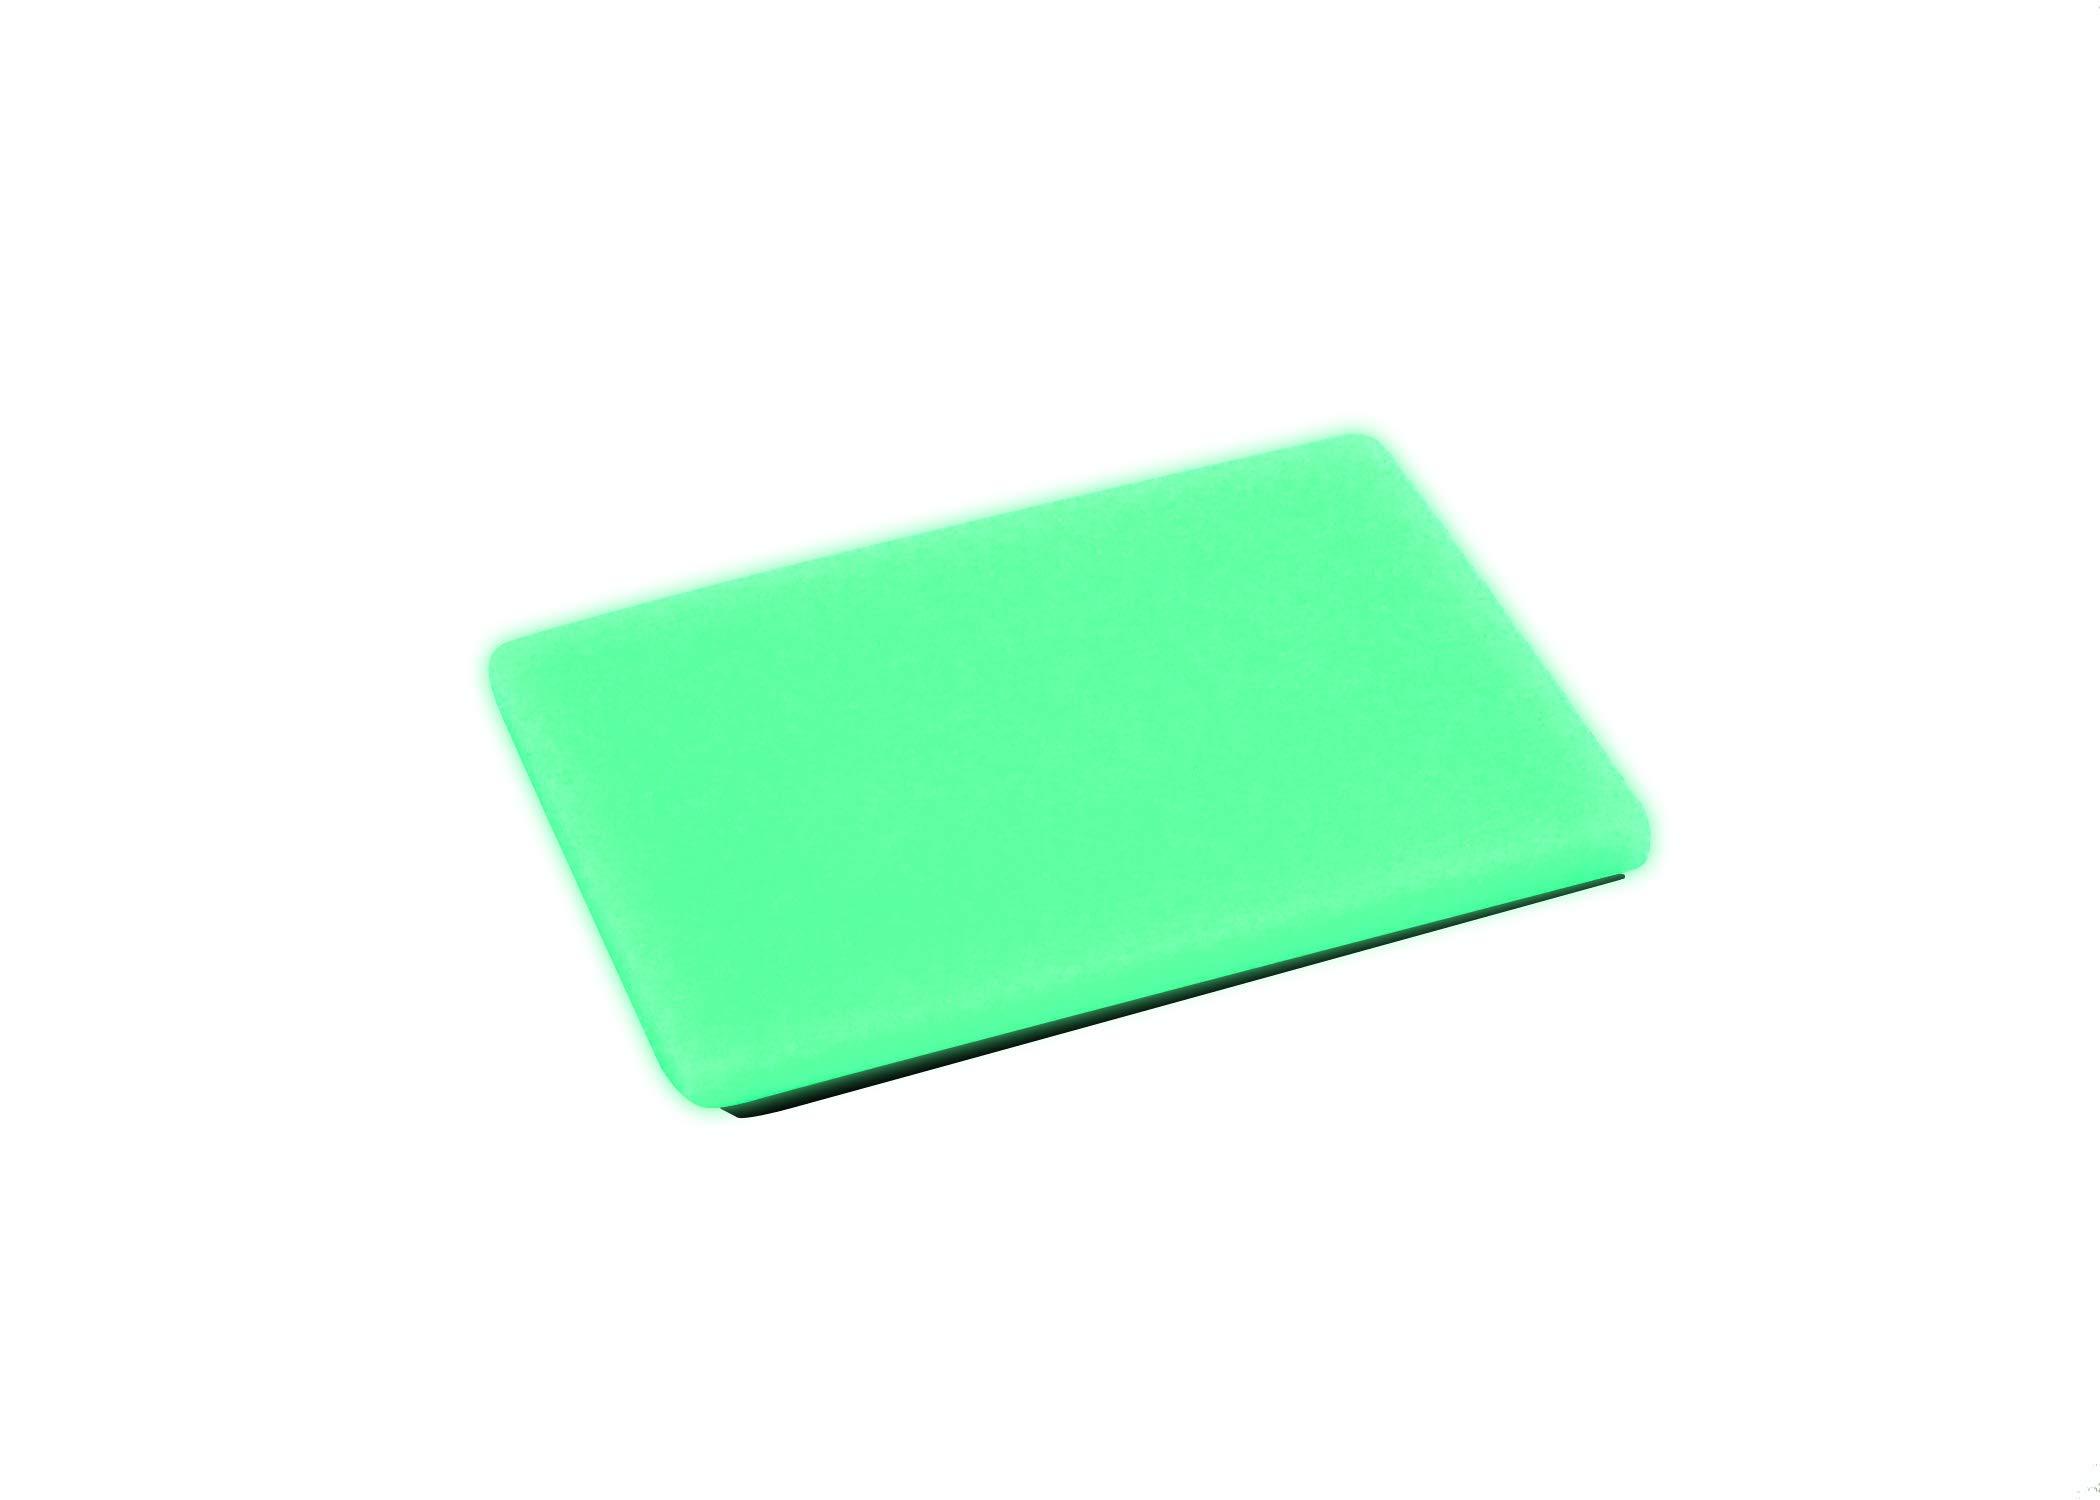 Embrite BEACON Morale Patch (2'' x 3'', Green Glow) - glow in the dark Velcro attachment by TEC Accessories